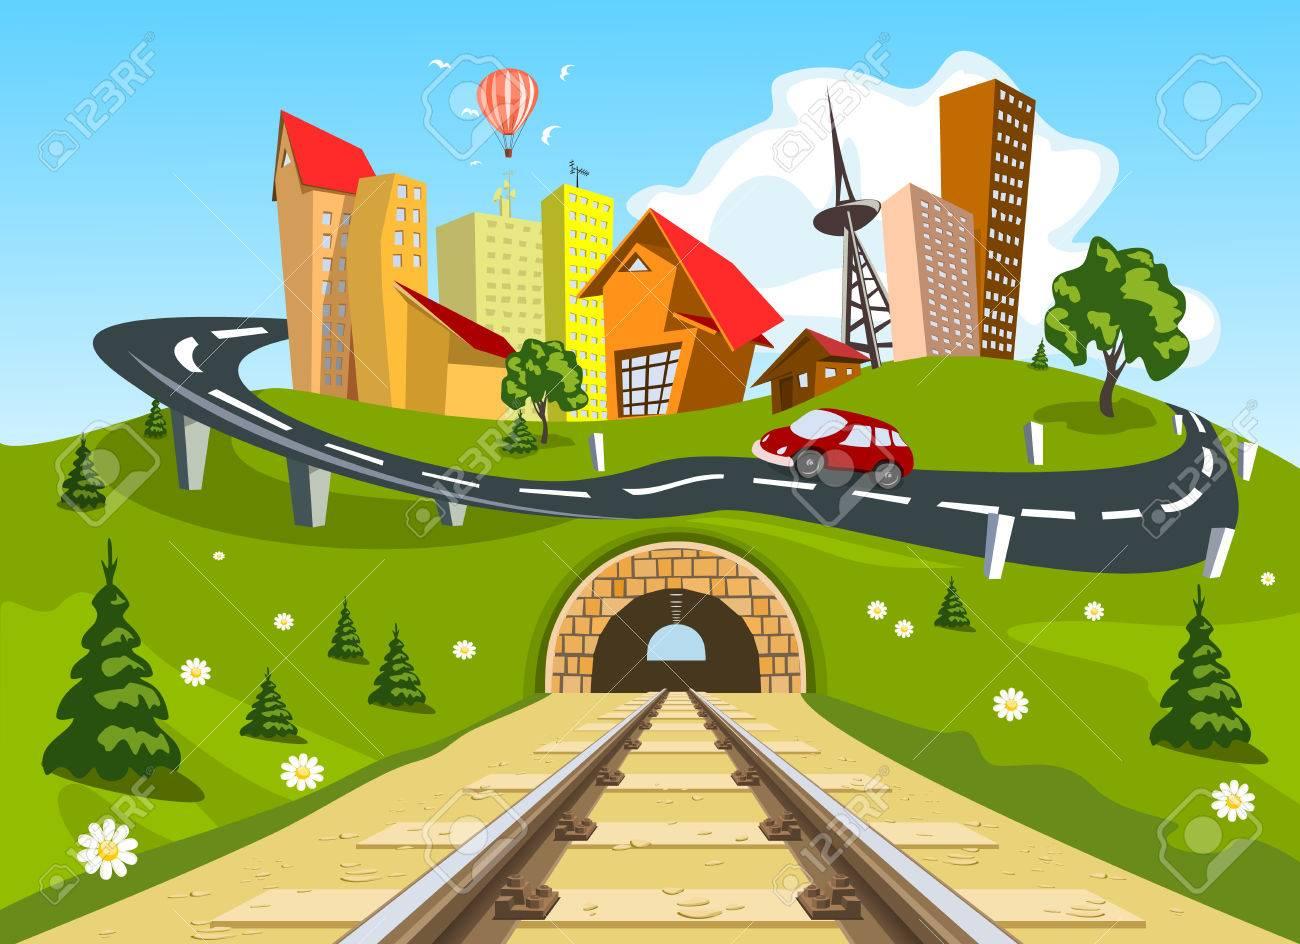 Railroad tracks through landscape to the city - 28463396